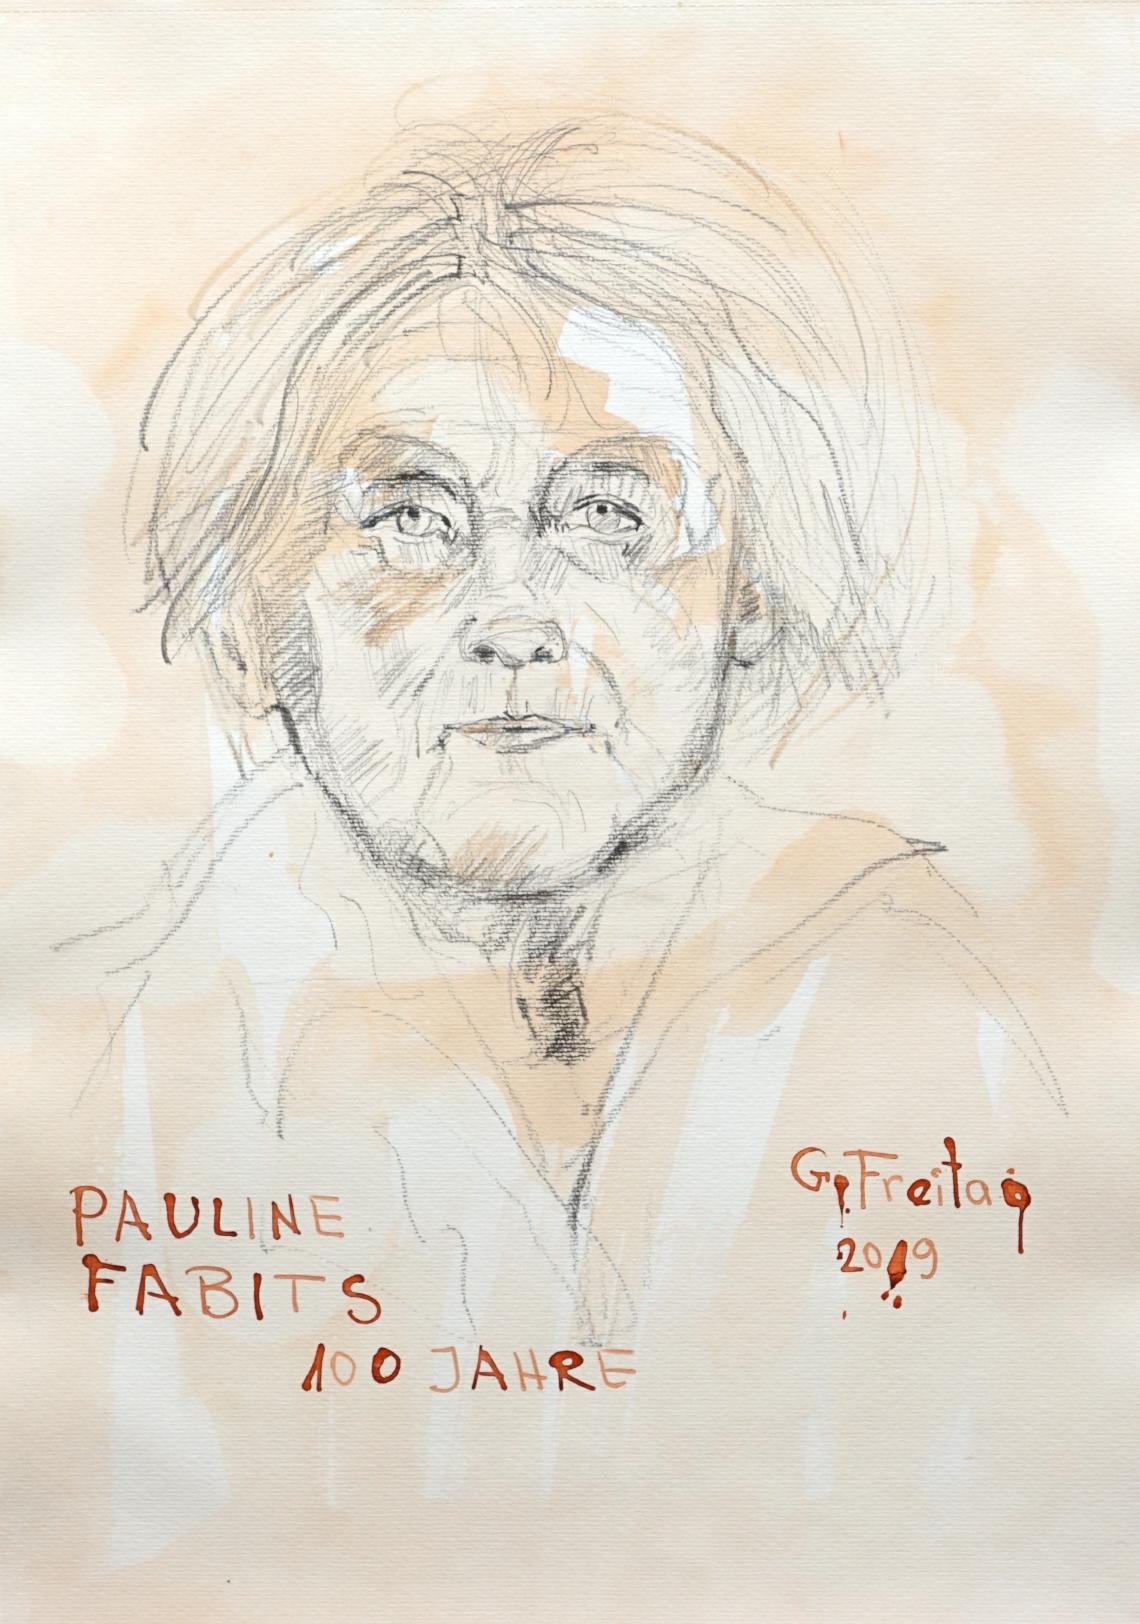 Pauline Fabits